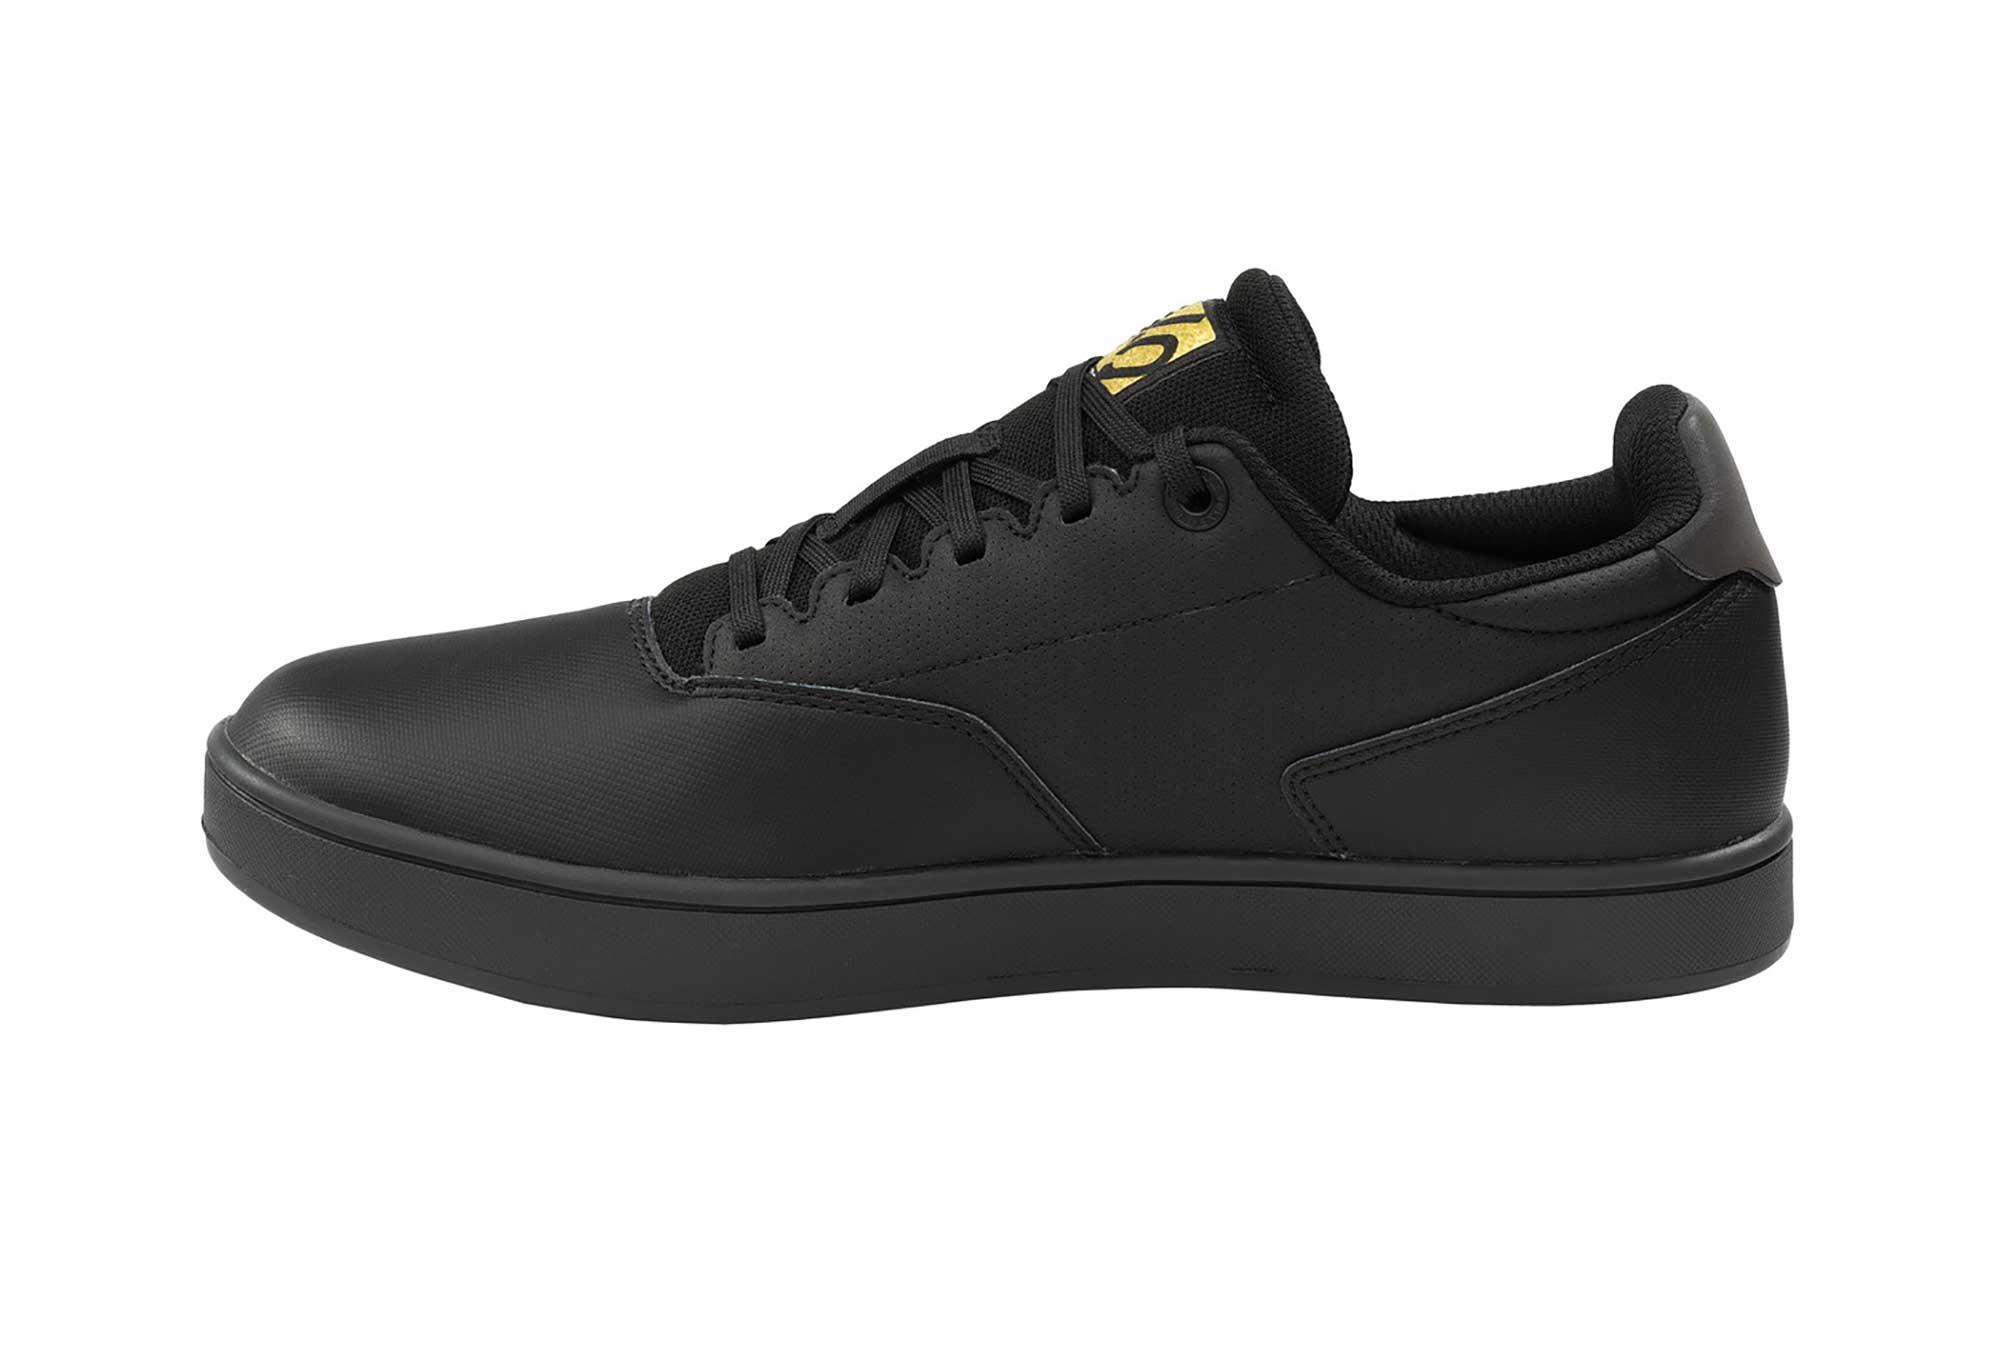 65bcba1bbf0 Five Ten 5.10 District Clip MTB Shoes Black | Alltricks.com